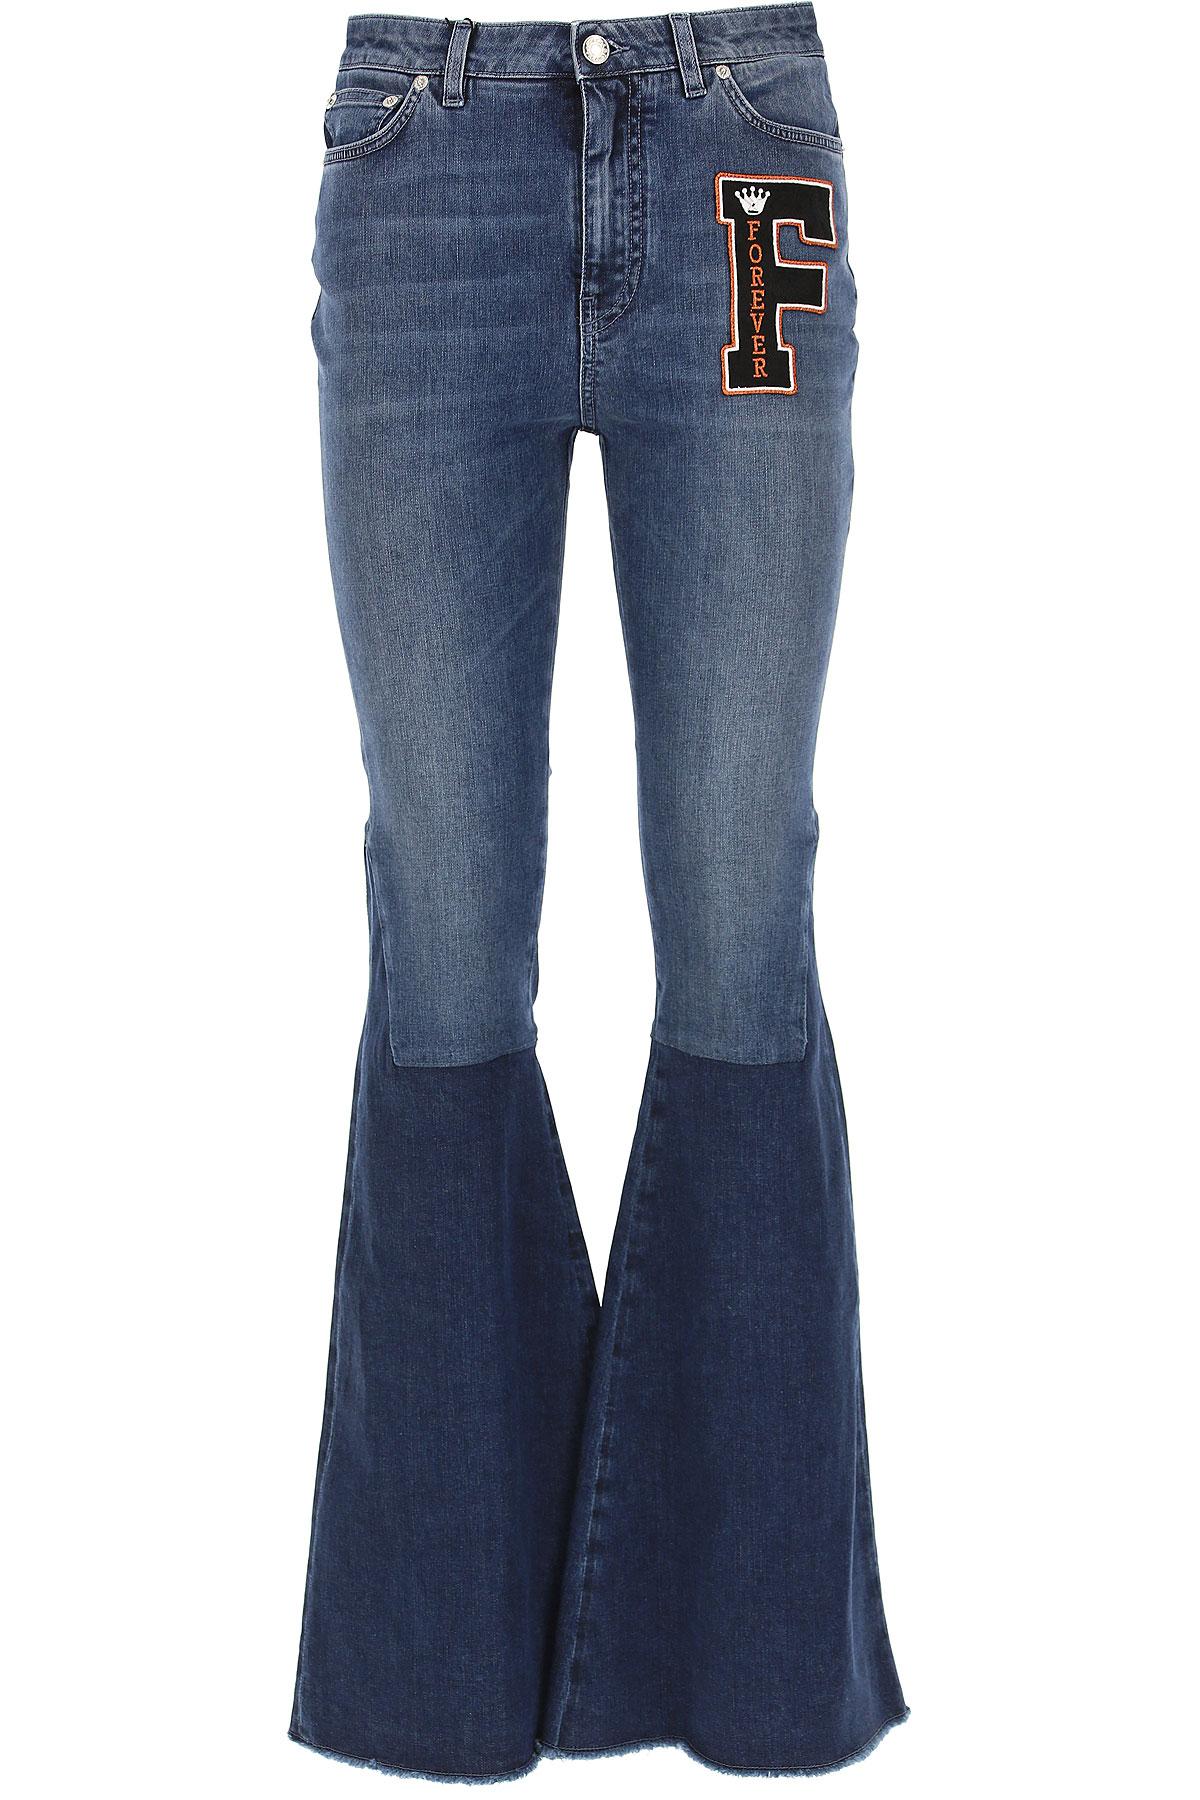 Dolce & Gabbana Jeans On Sale, Denim, Cotton, 2017, 22 24 28 30